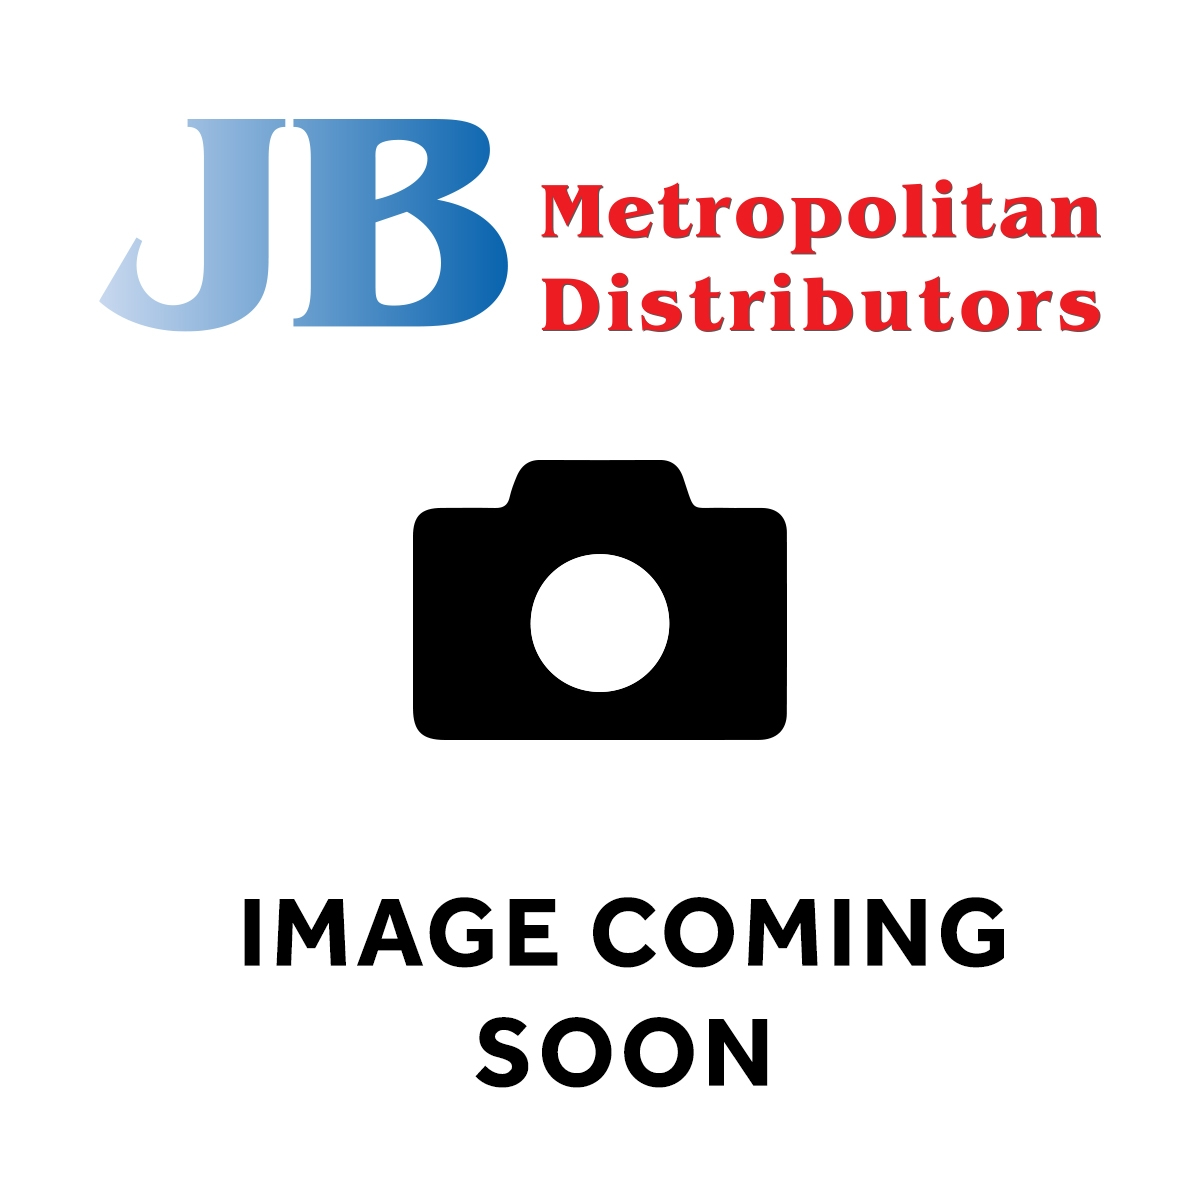 JC QUALITY OUTBACK MIX 150G (12)